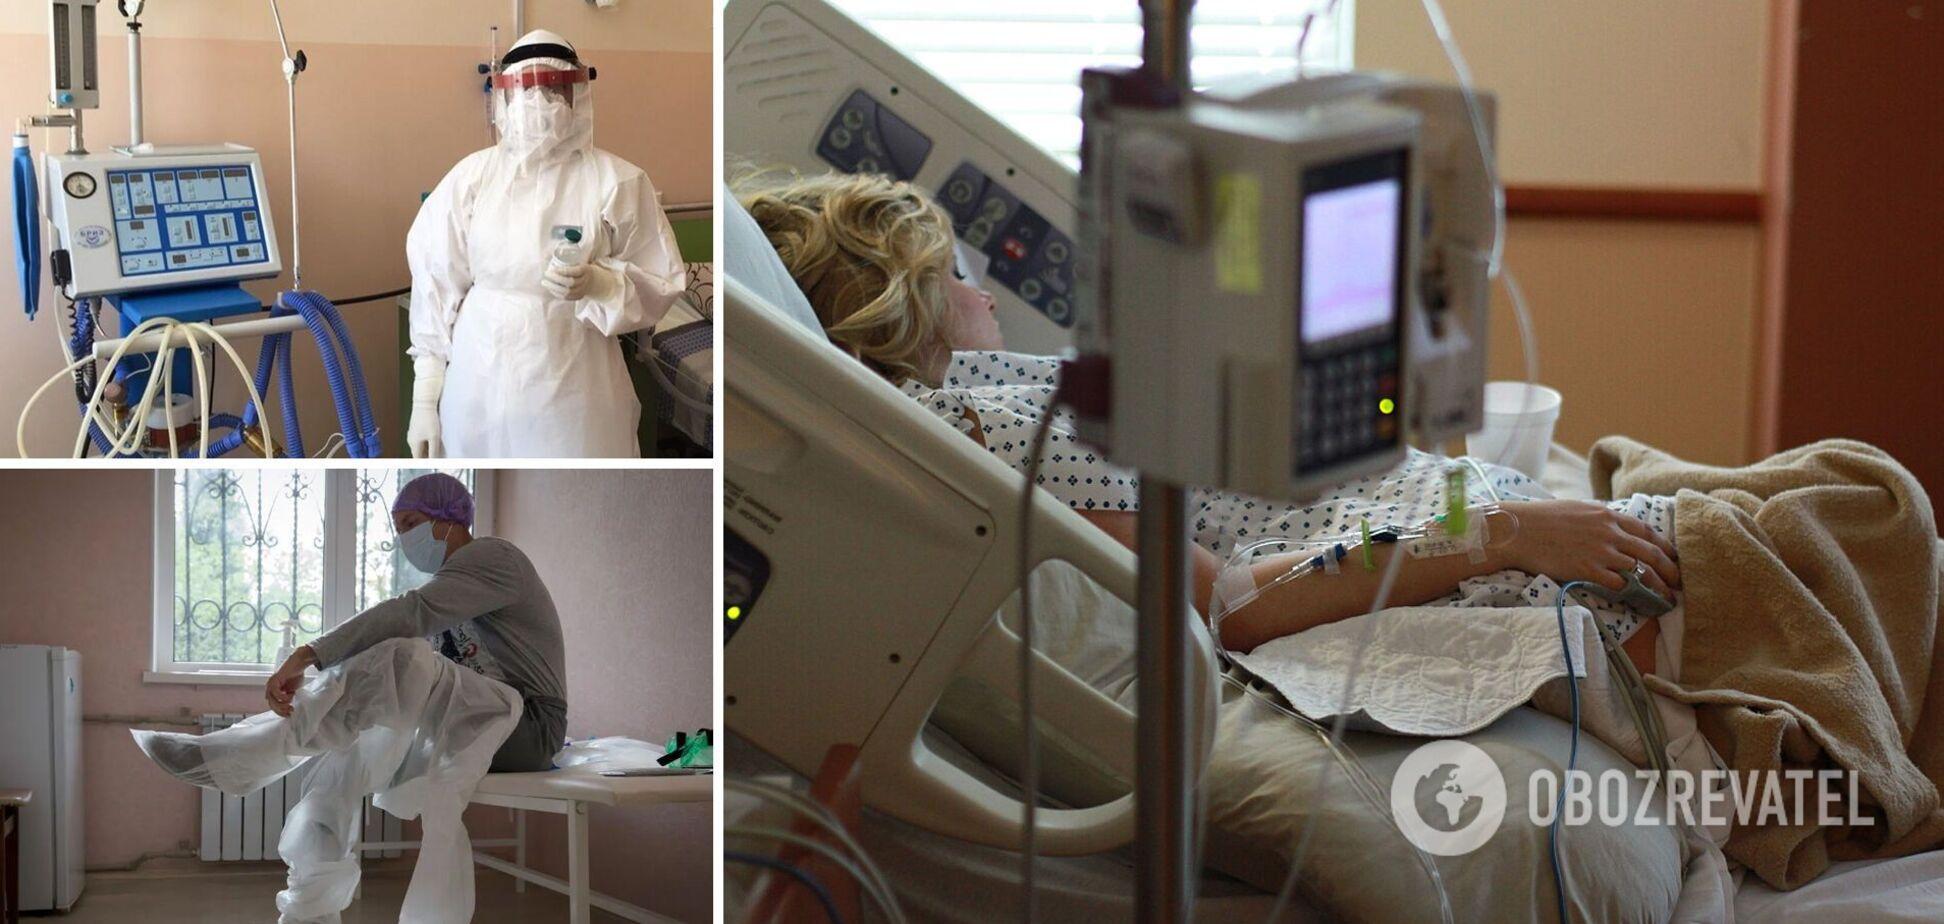 После ИВЛ умирают 9 из 10 украинцев с COVID-19: врачи пояснили тревожную статистику